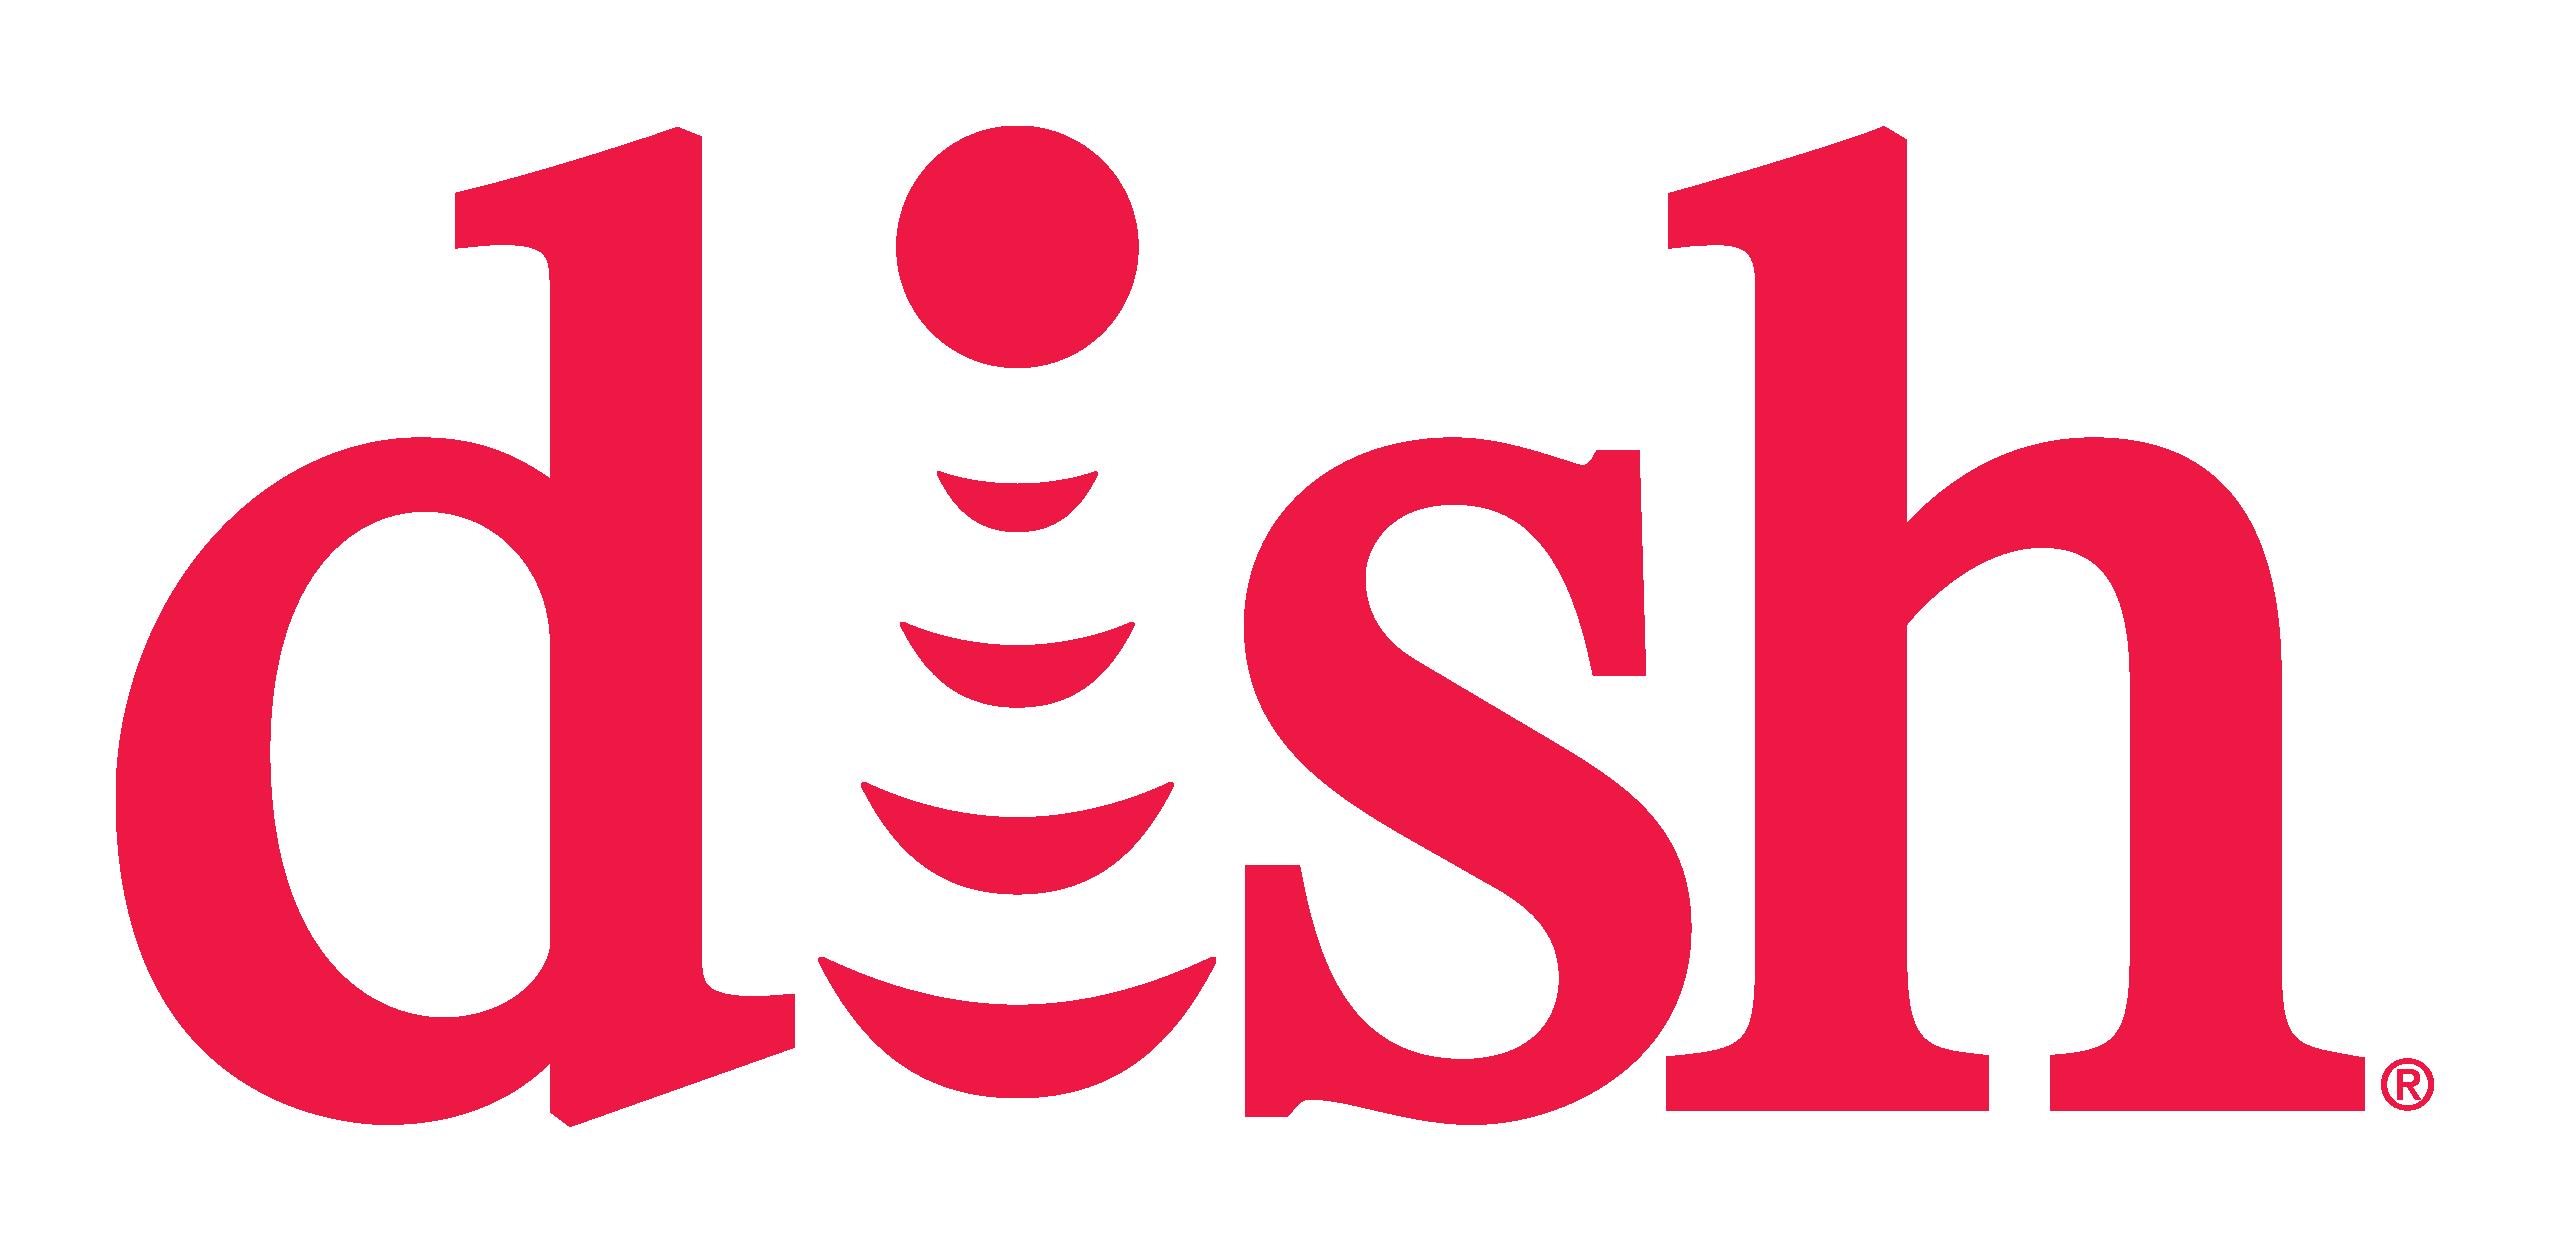 Dish Network Logo PNG Image.